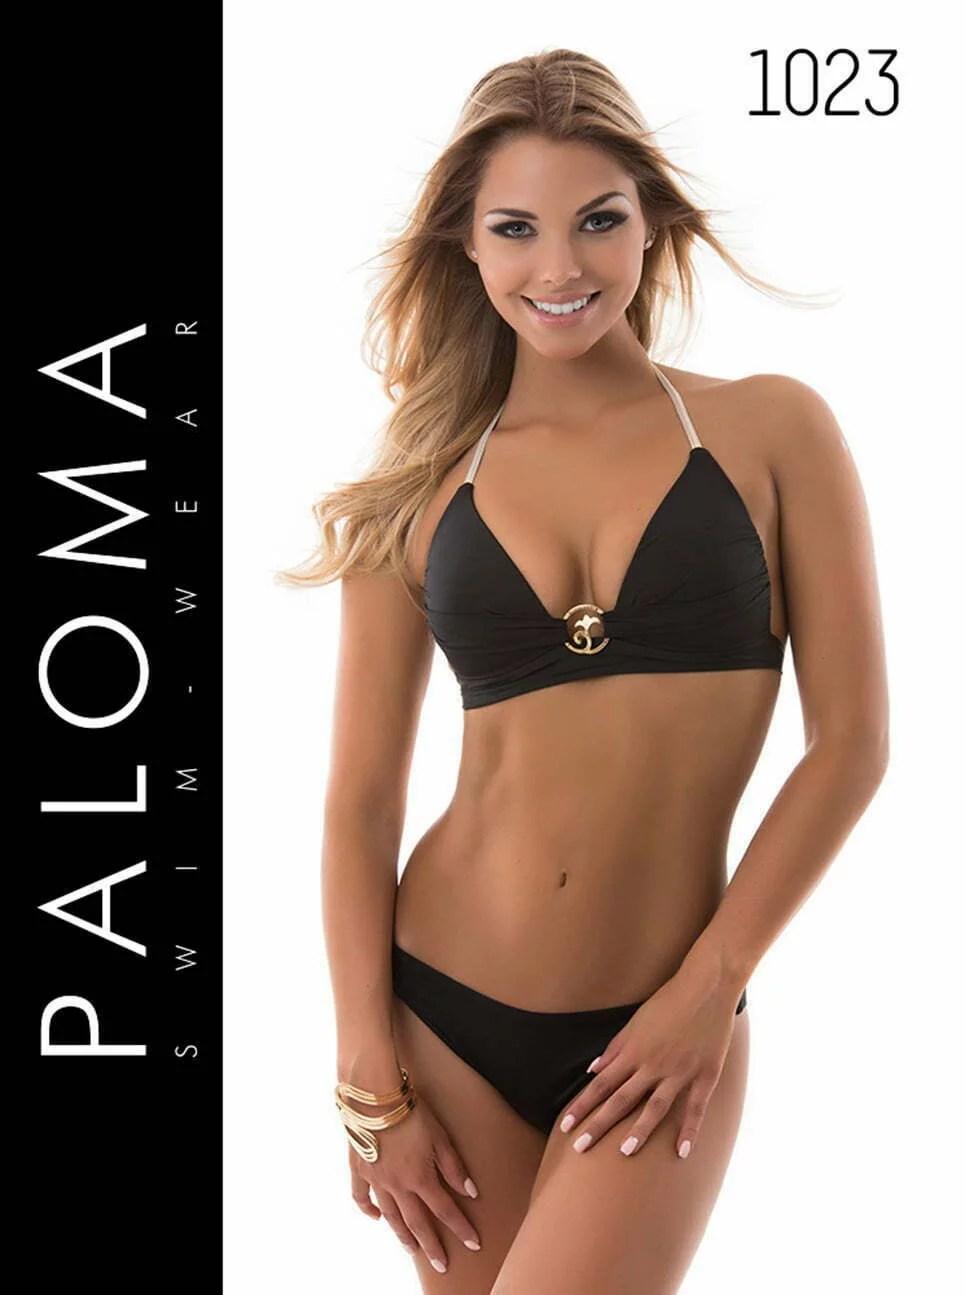 PALOMA fekete push-up háromszög bikini 1023